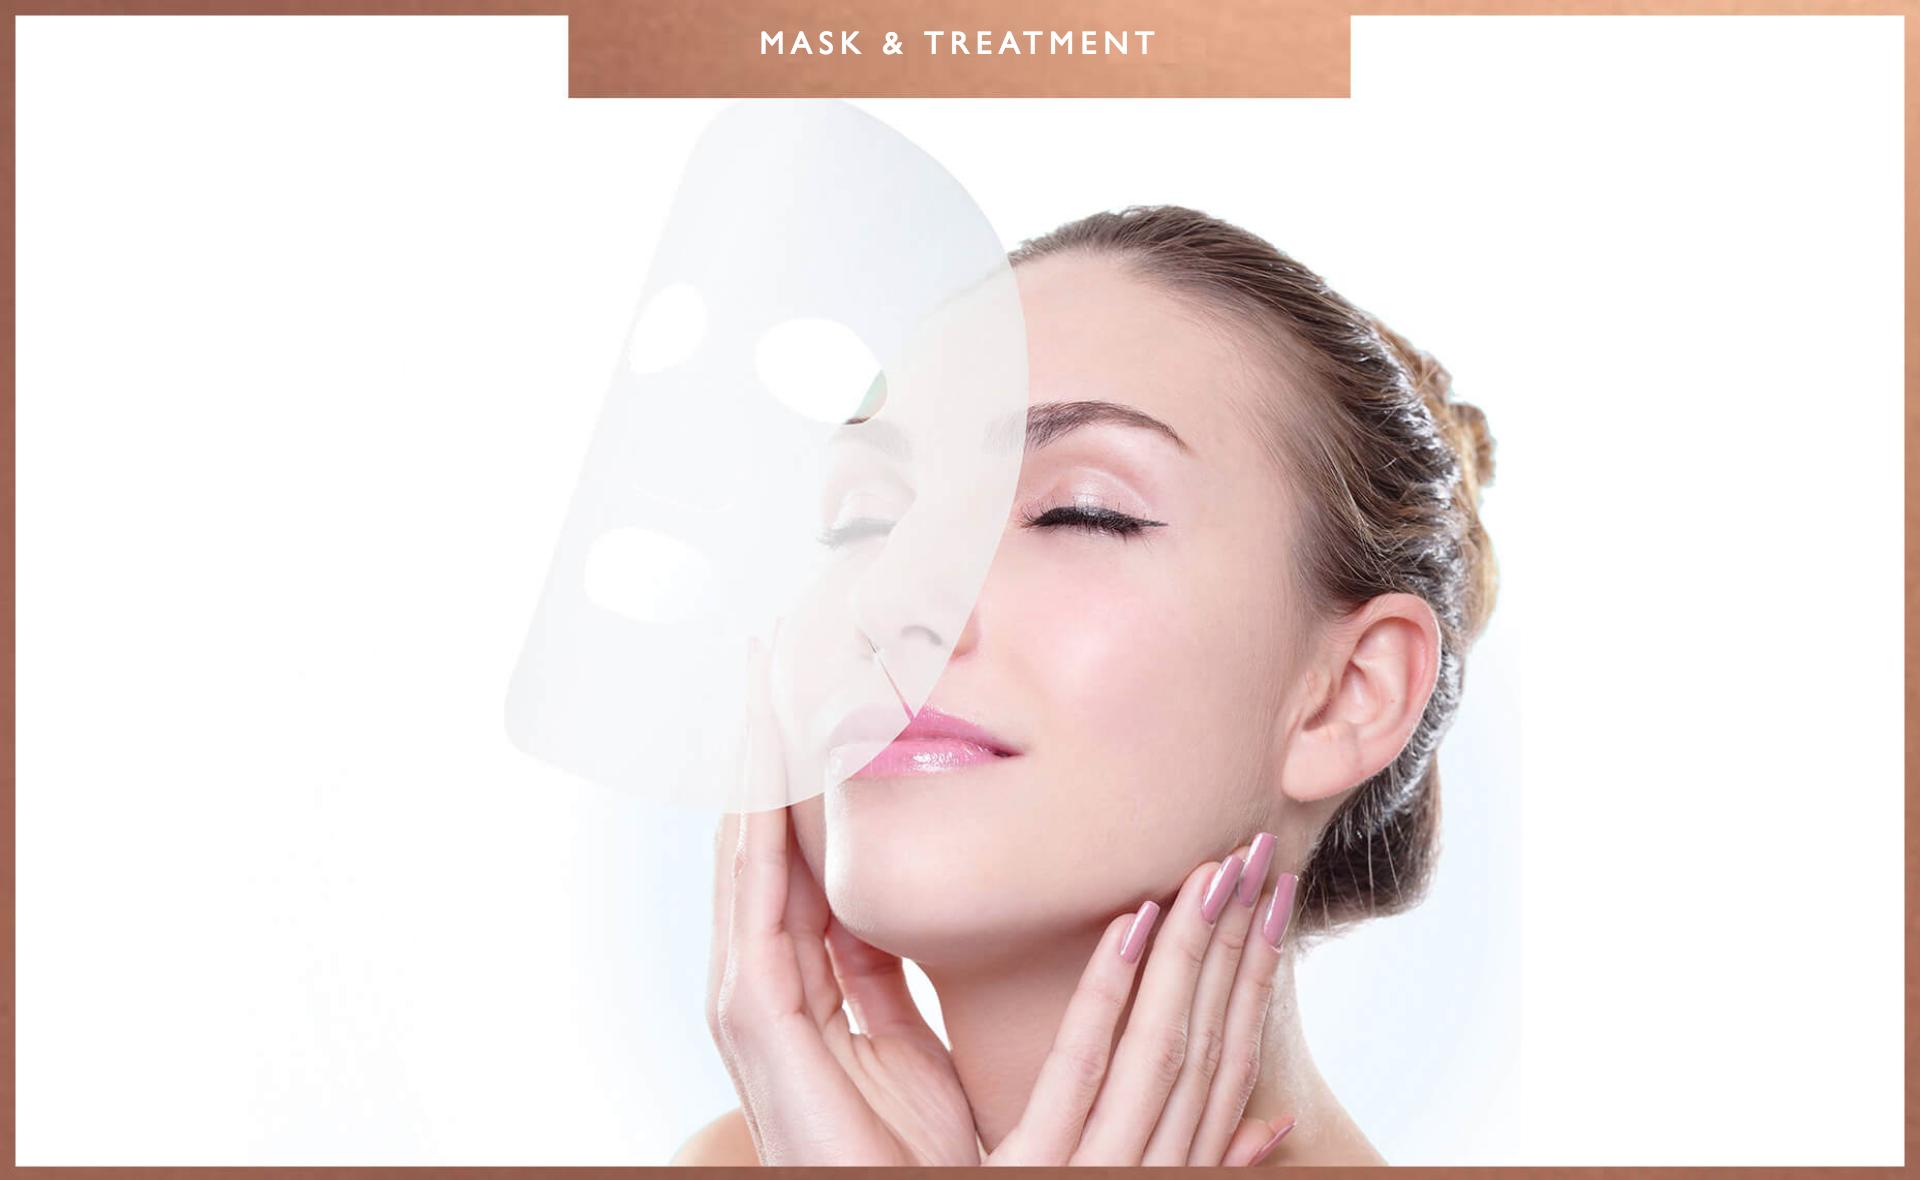 Mask & Treatment